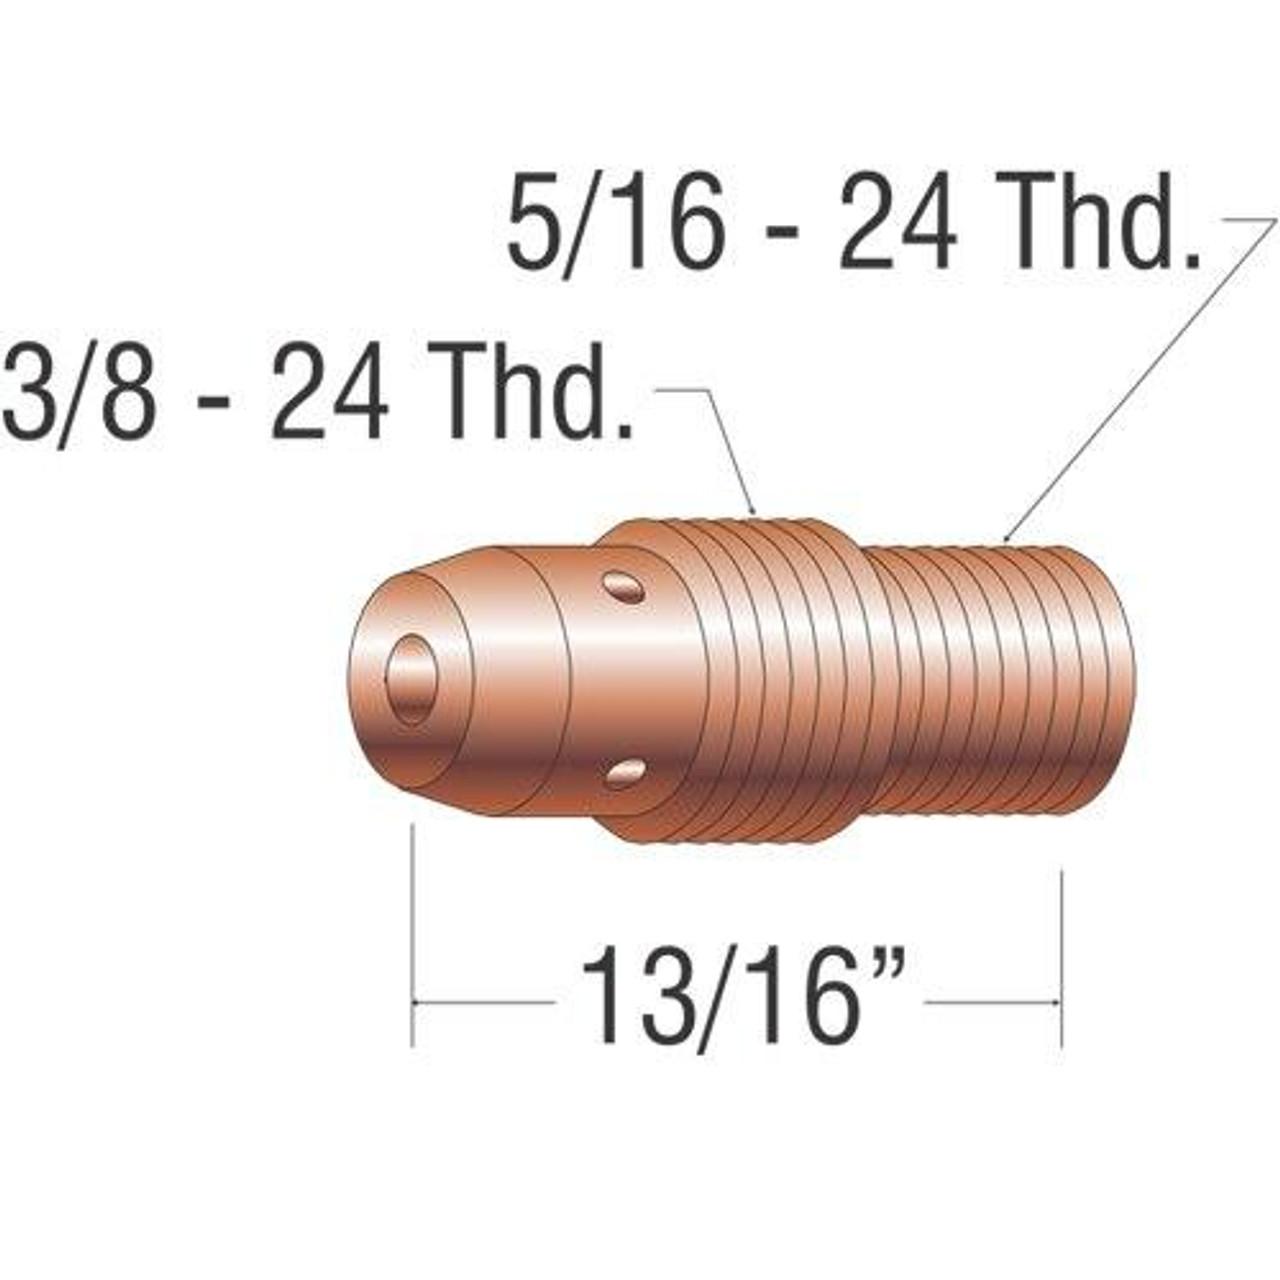 Profax 13N26 Collett Body .040 9-20-25 Series TIG Torch - 10 Pack